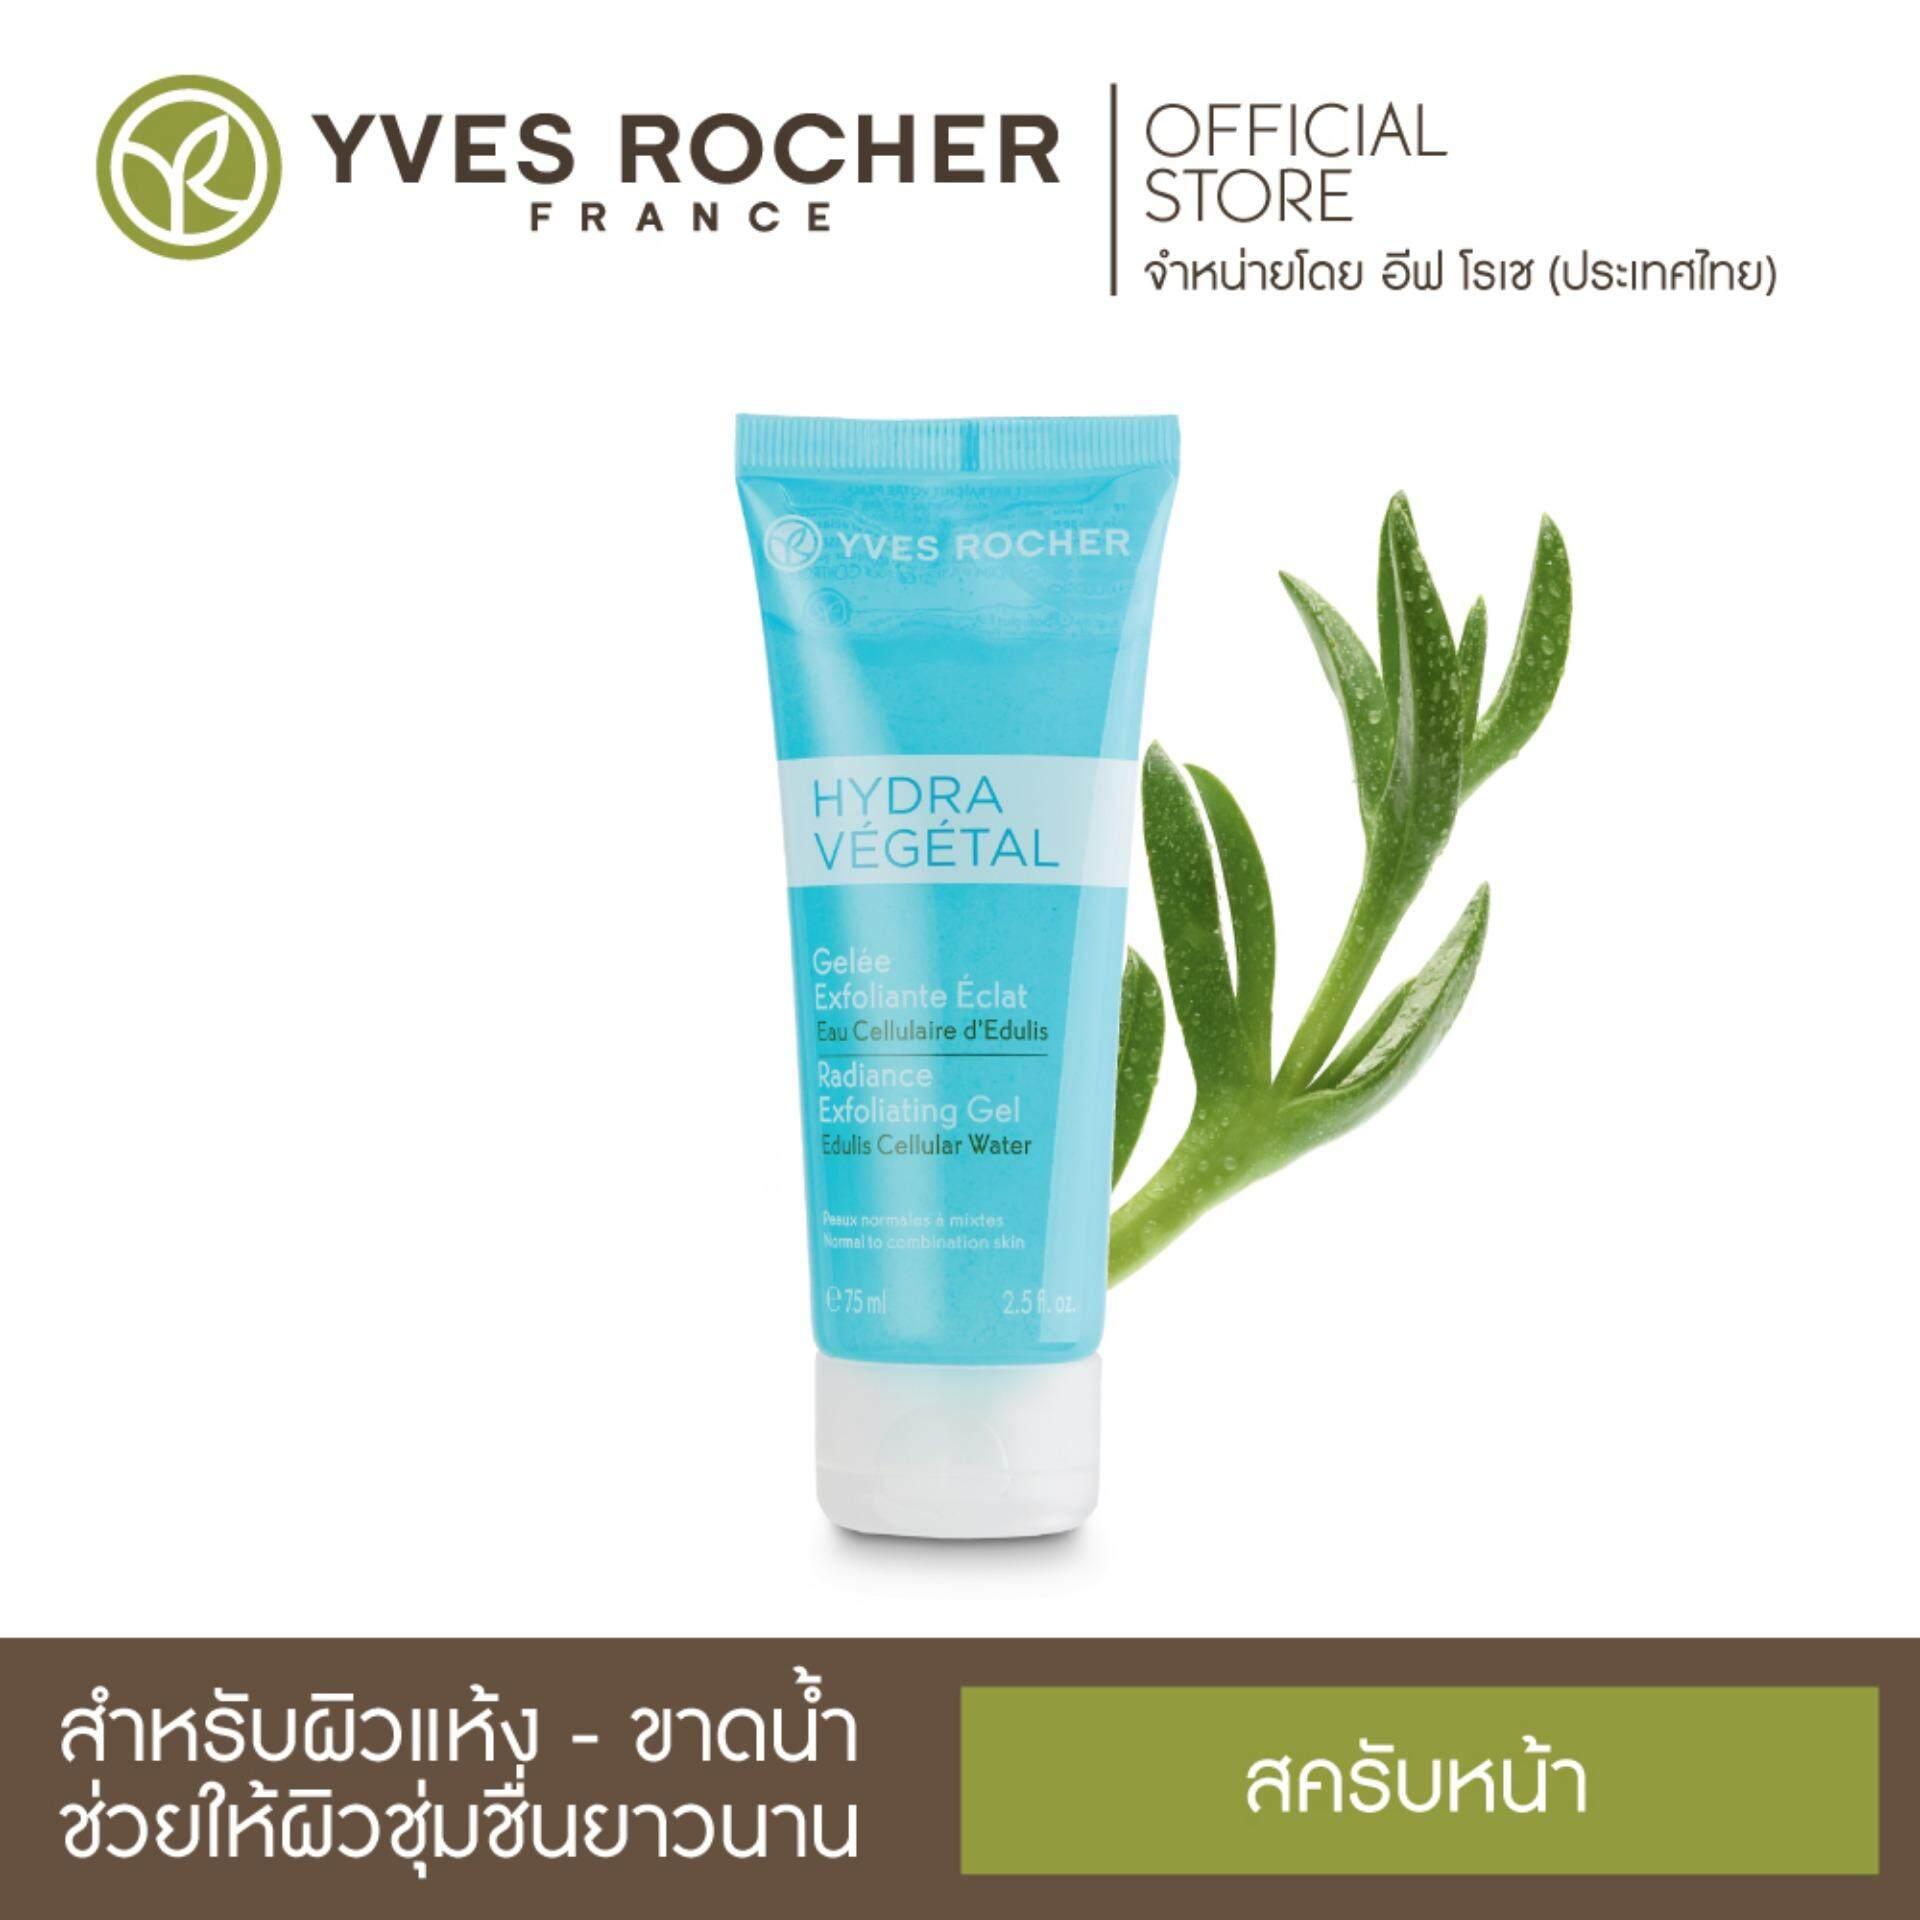 Yves Rocher Hydra Vegetal Radiance Exfoliating Gel 75ml.